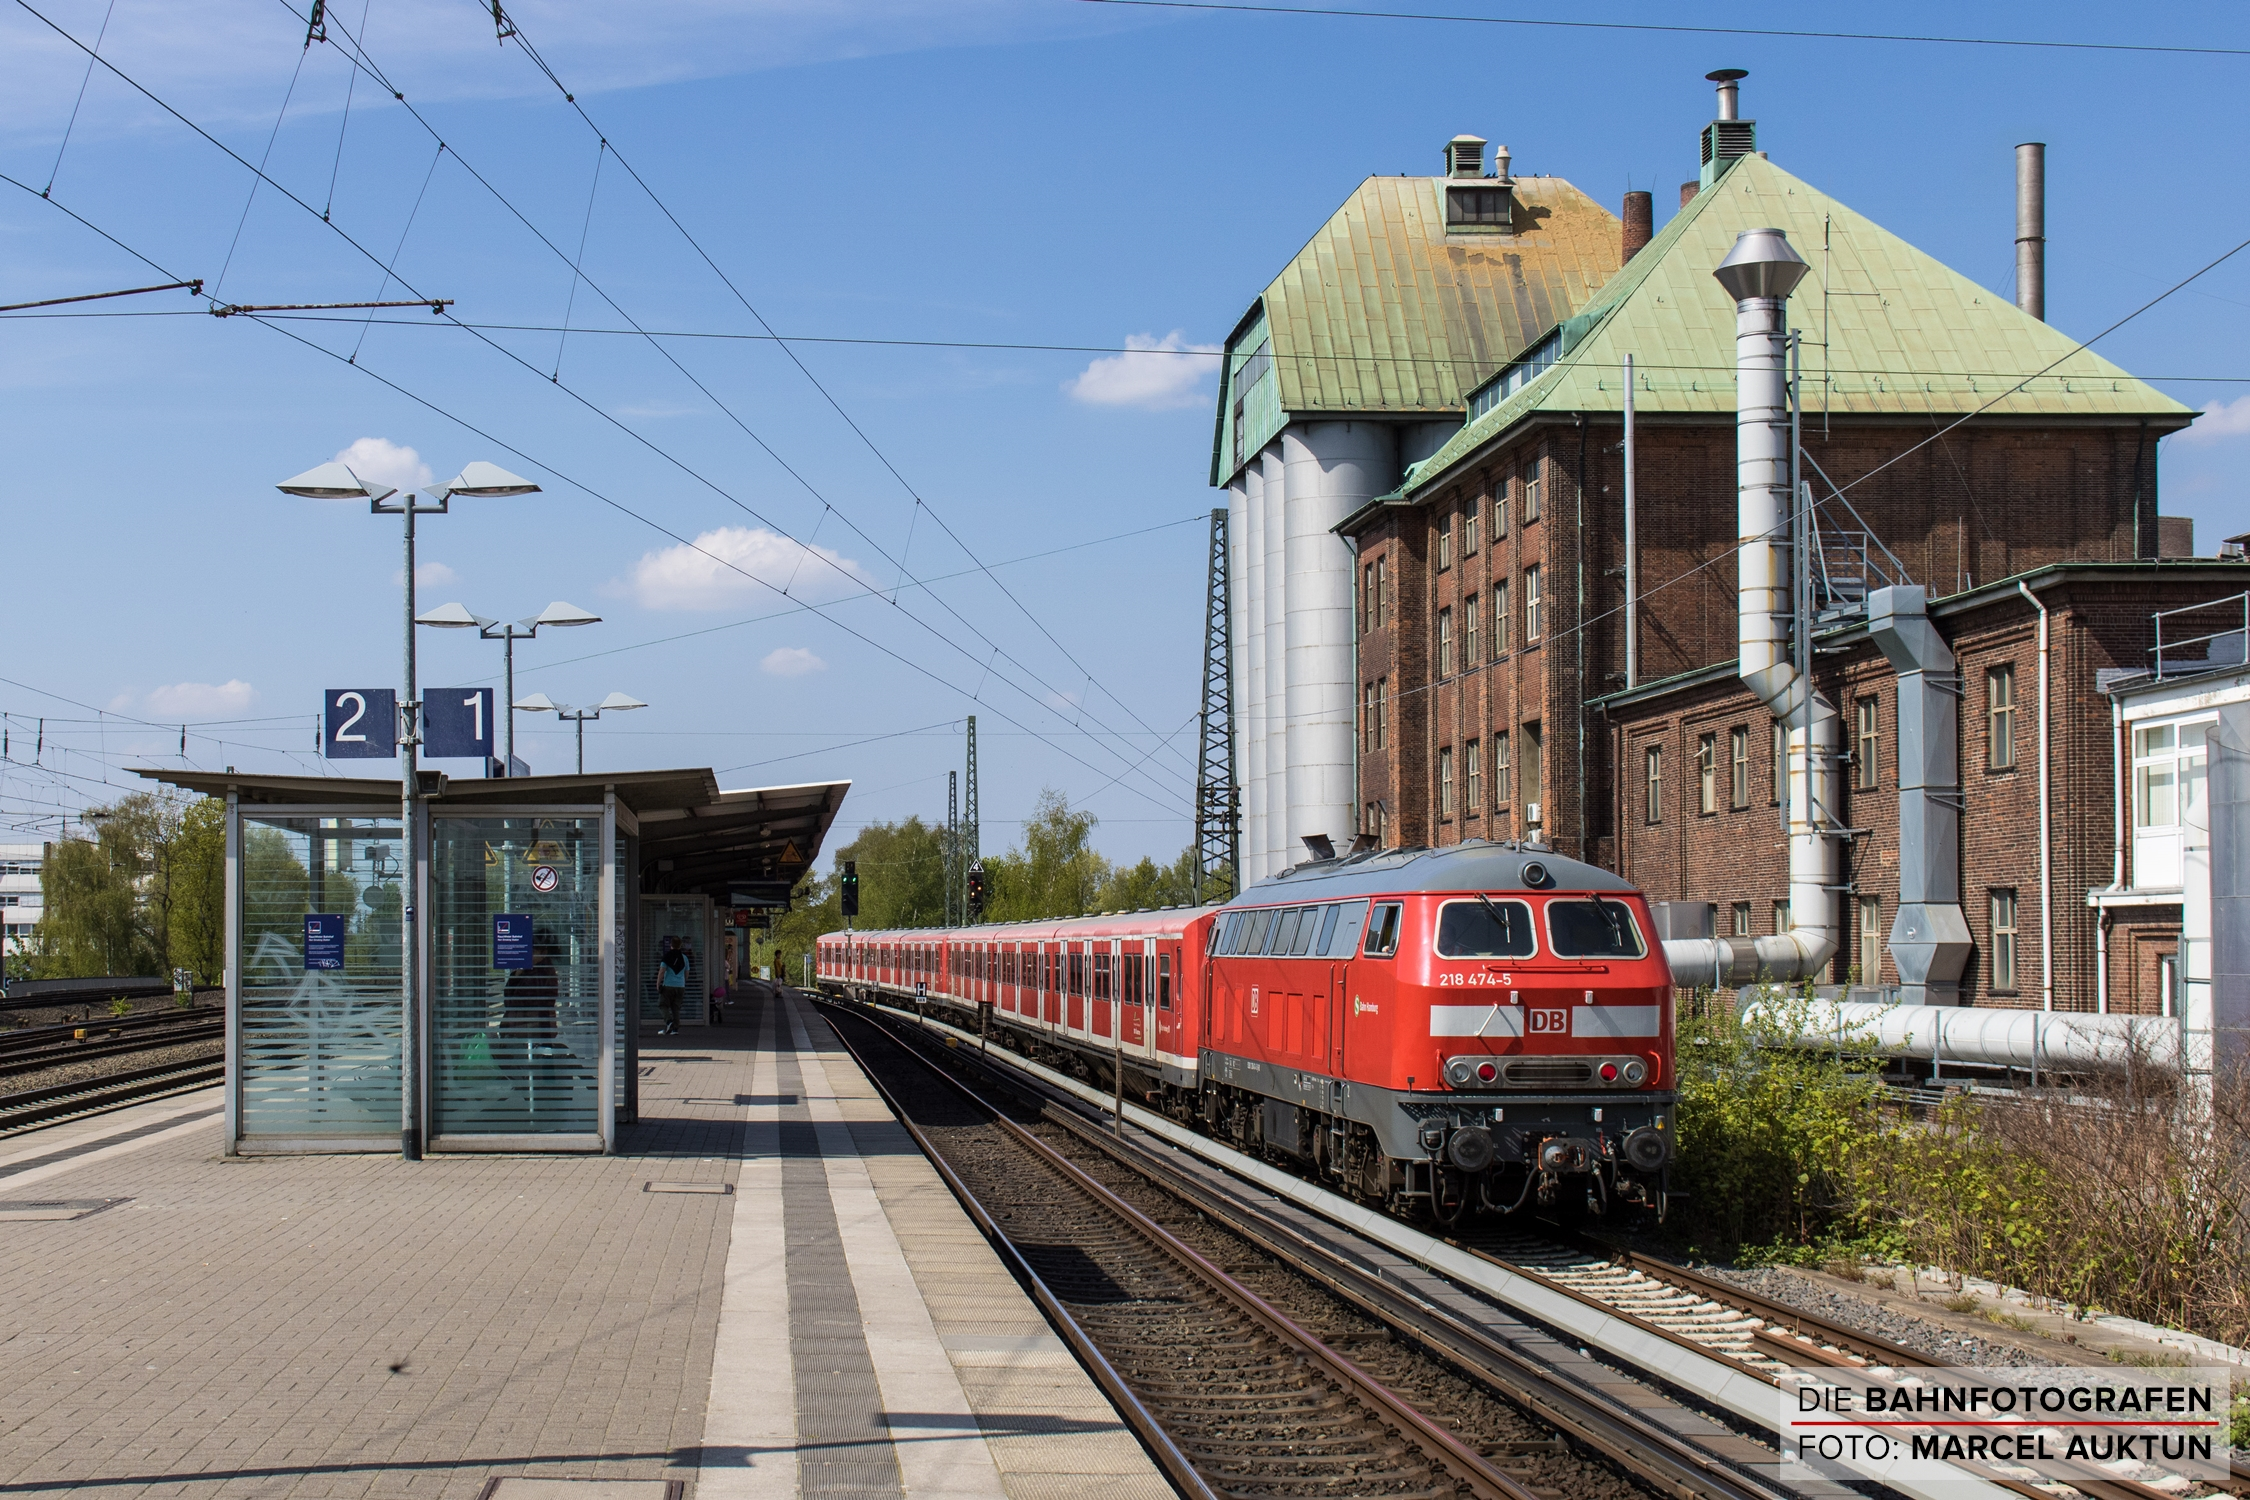 https://diebahnfotografen.de/wp-content/uploads/2020/05/218-474-472-057-472-059-Eidelstedt.jpg